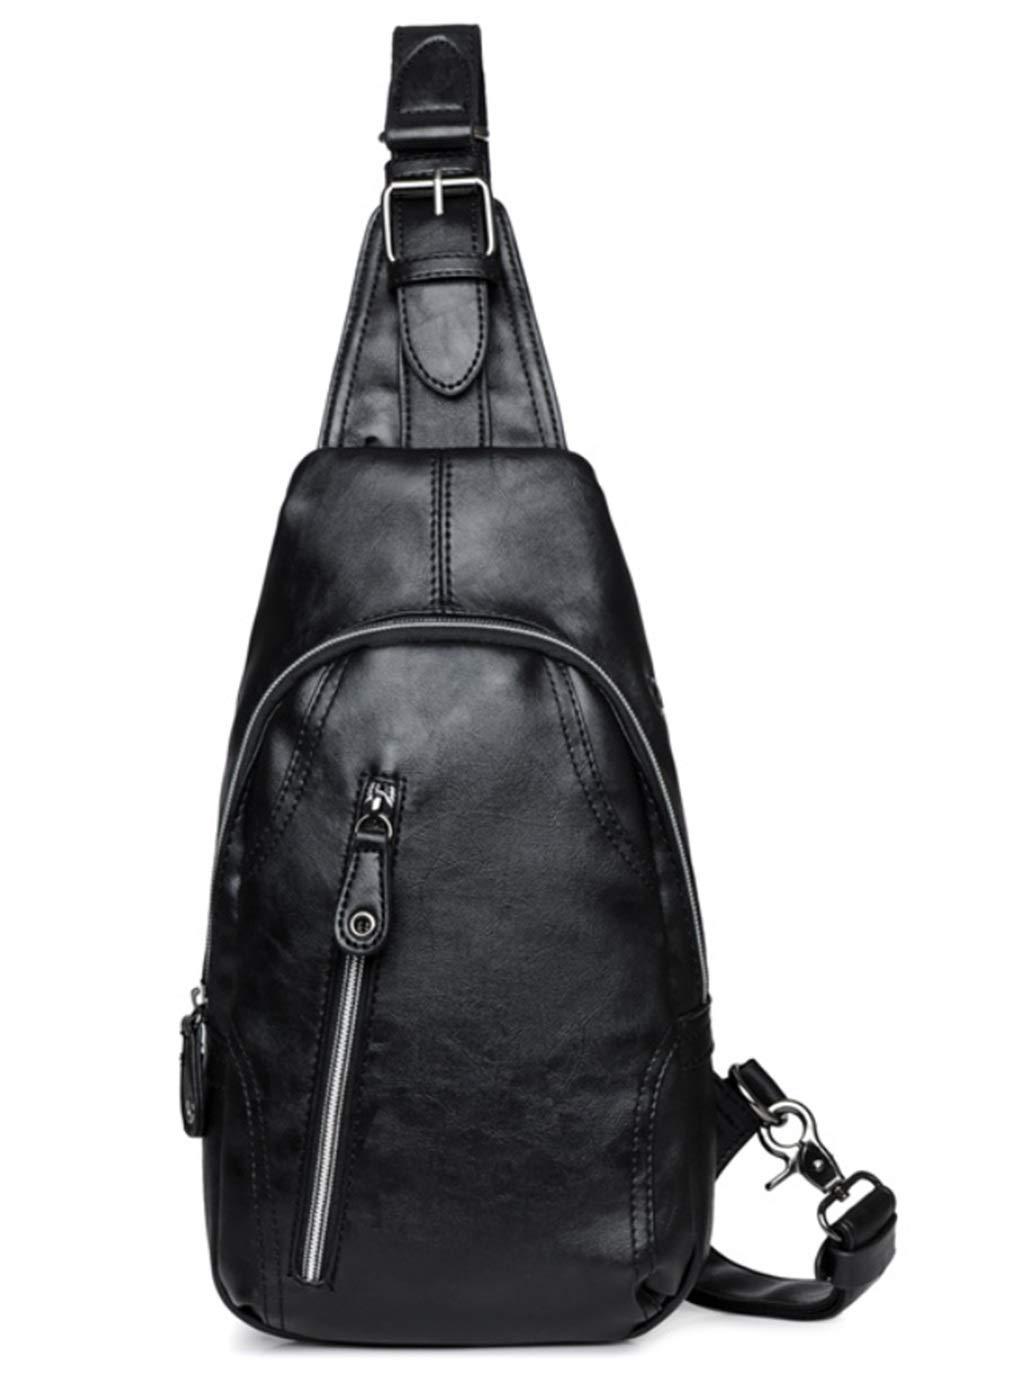 RSQJ Male Chest Bag Waterproof Wearable Shoulder Bag Small Diagonal Bag (Size : 16532cm)